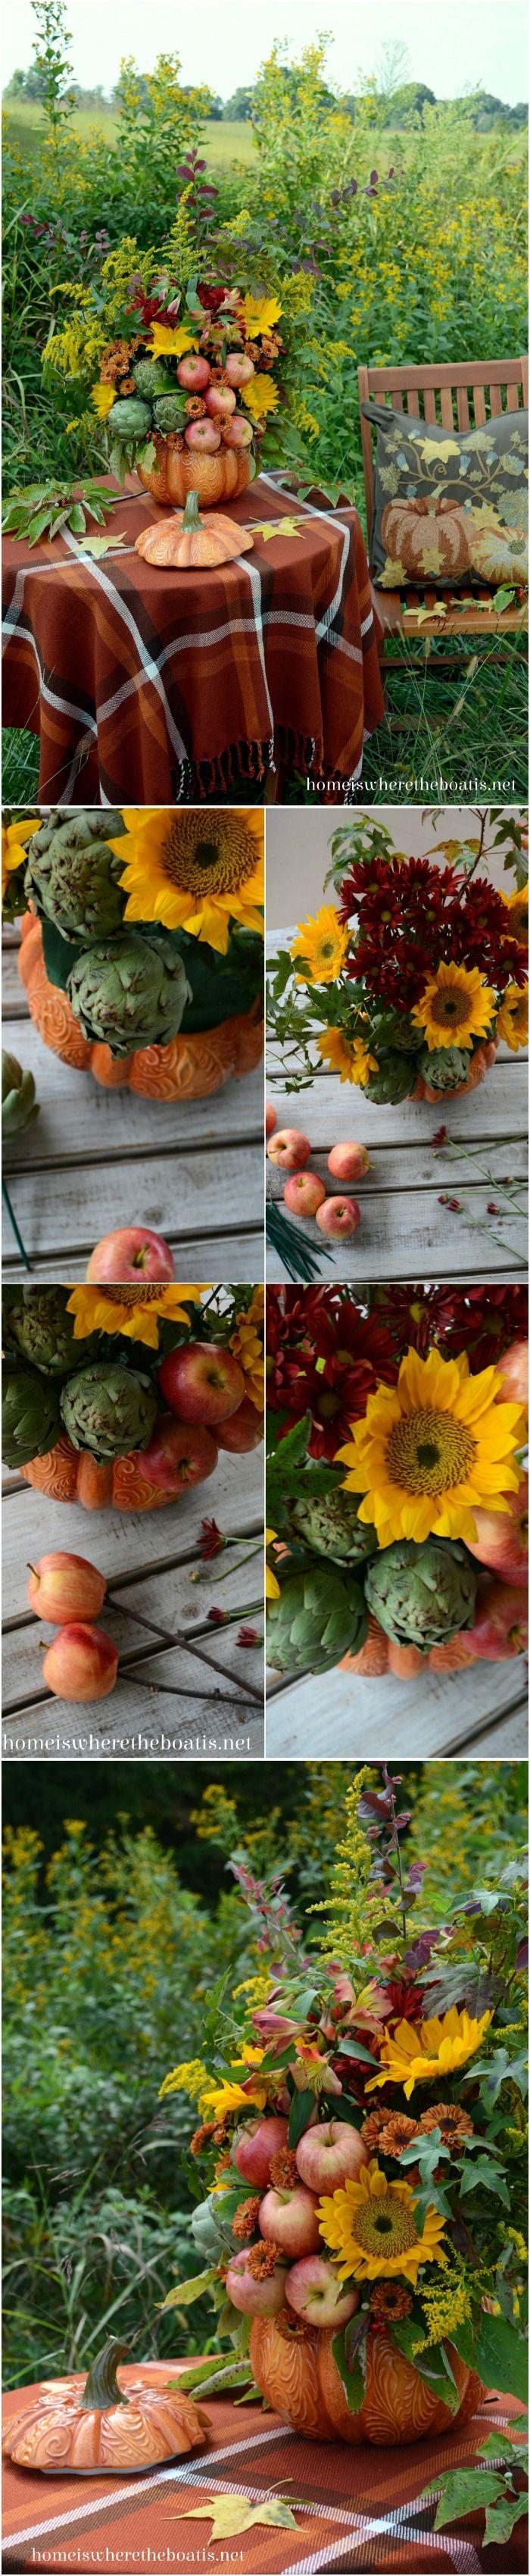 From Pumpkin Tureen to Seasonal Centerpiece! Big bang for little $.  LOVE it!